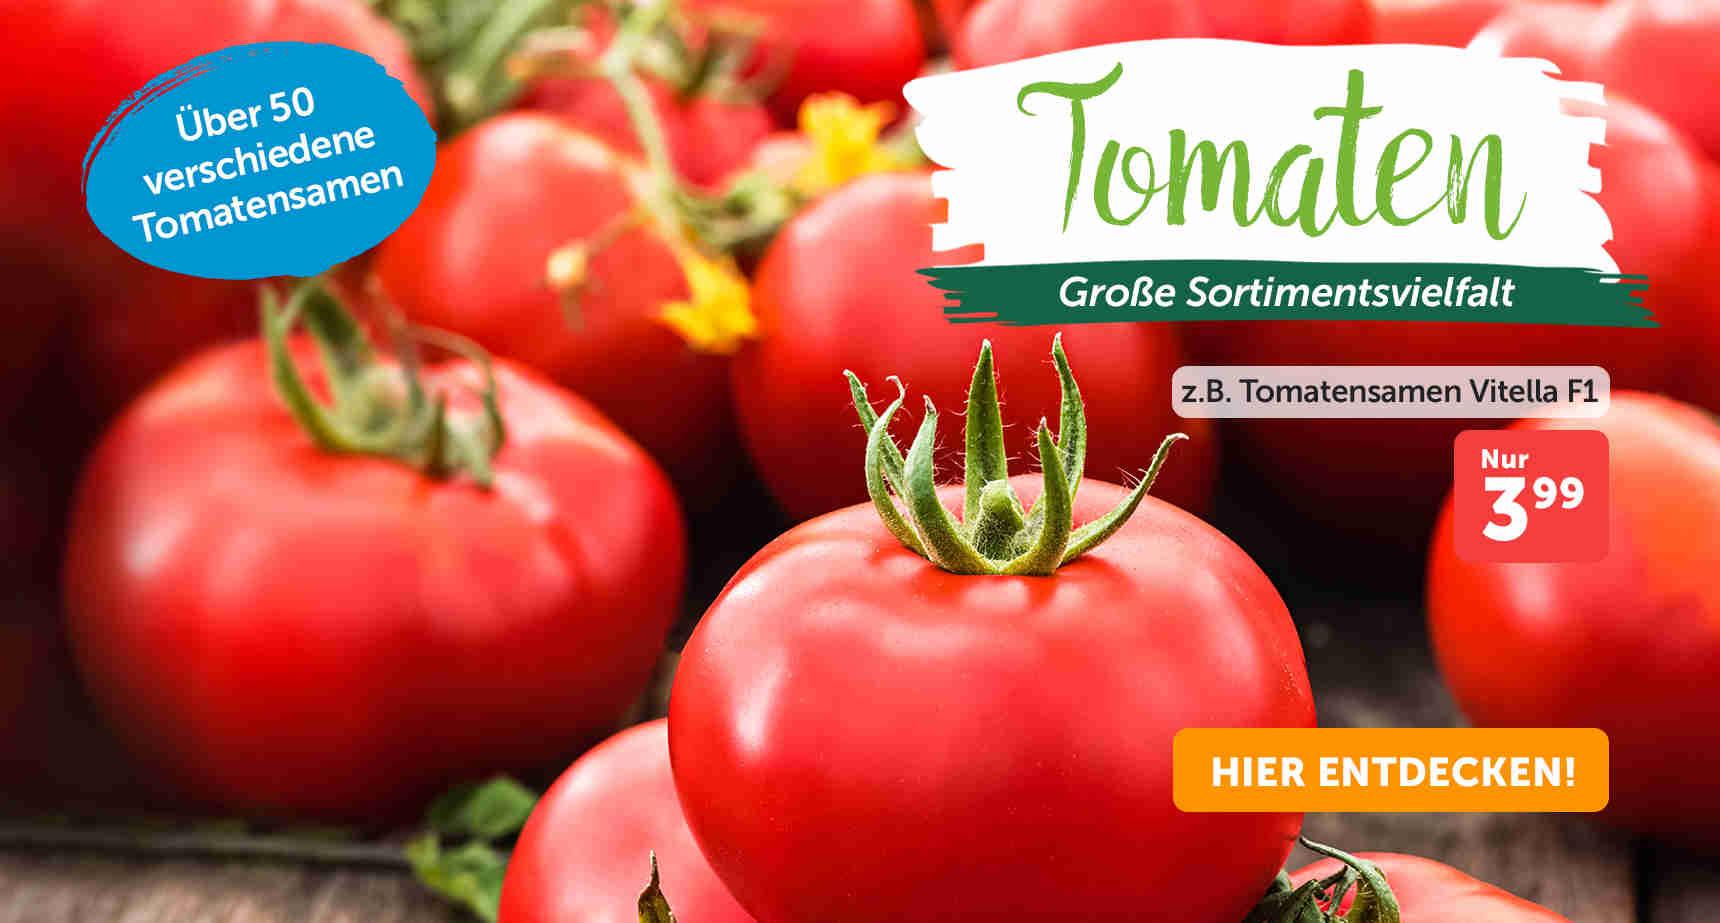 +++ (1) Tomatenvielfalt +++ - 3